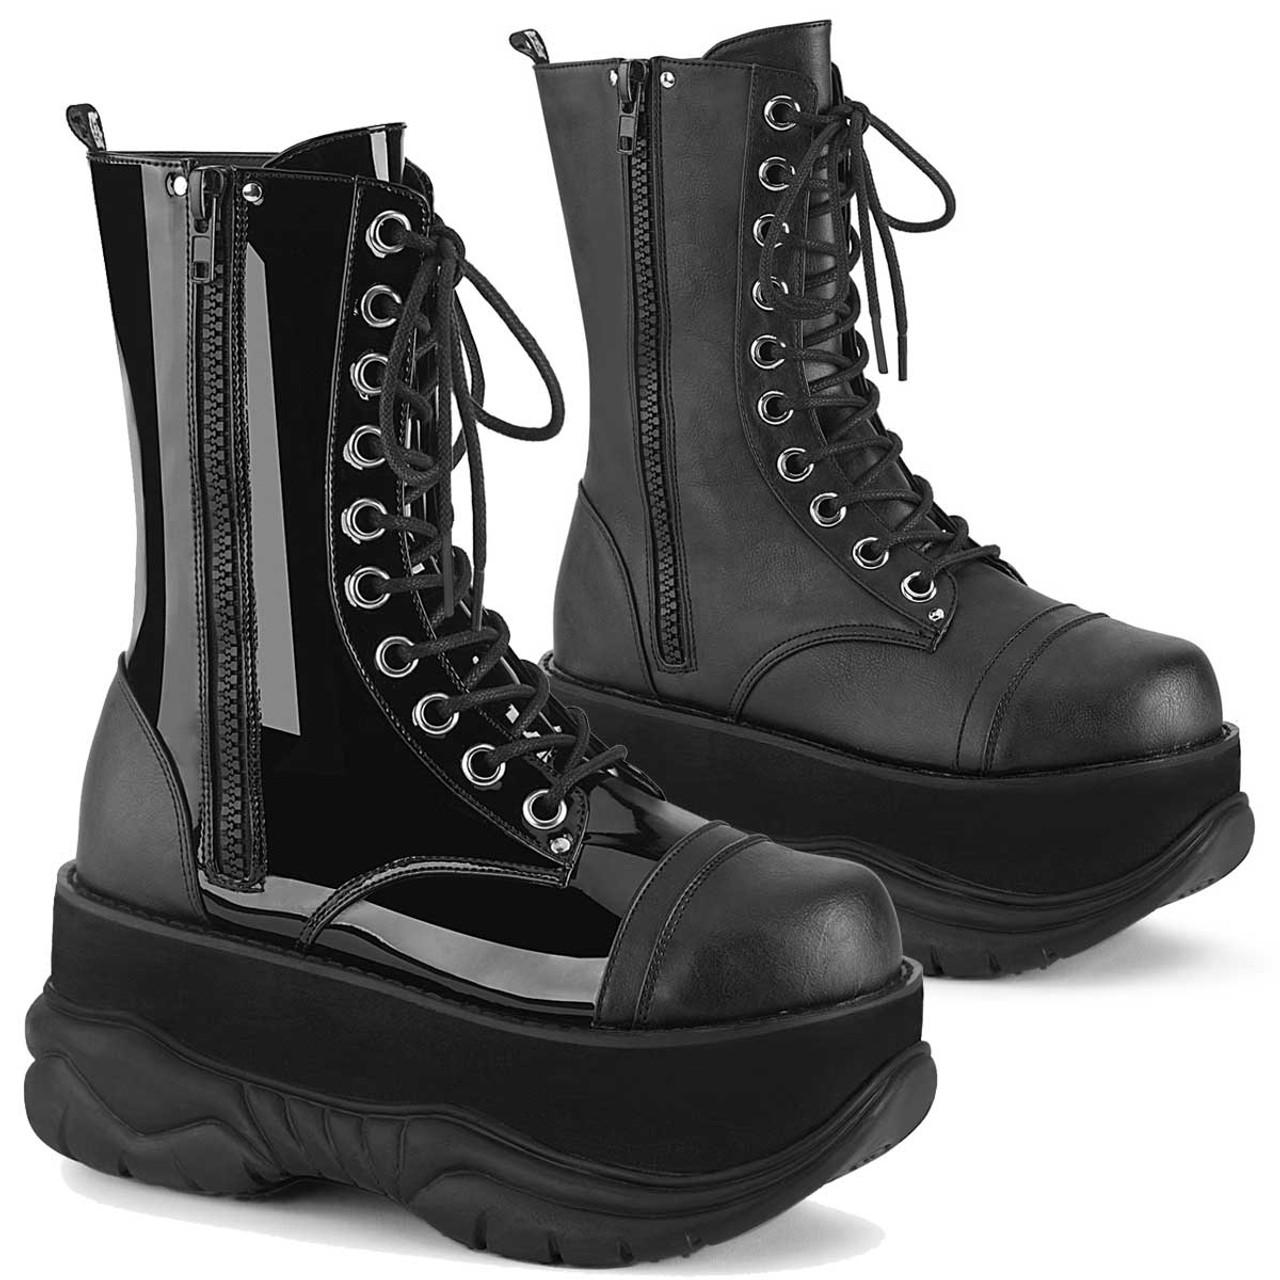 Demonia   Neptune 200 Men's Goth Platform Lace up Boots